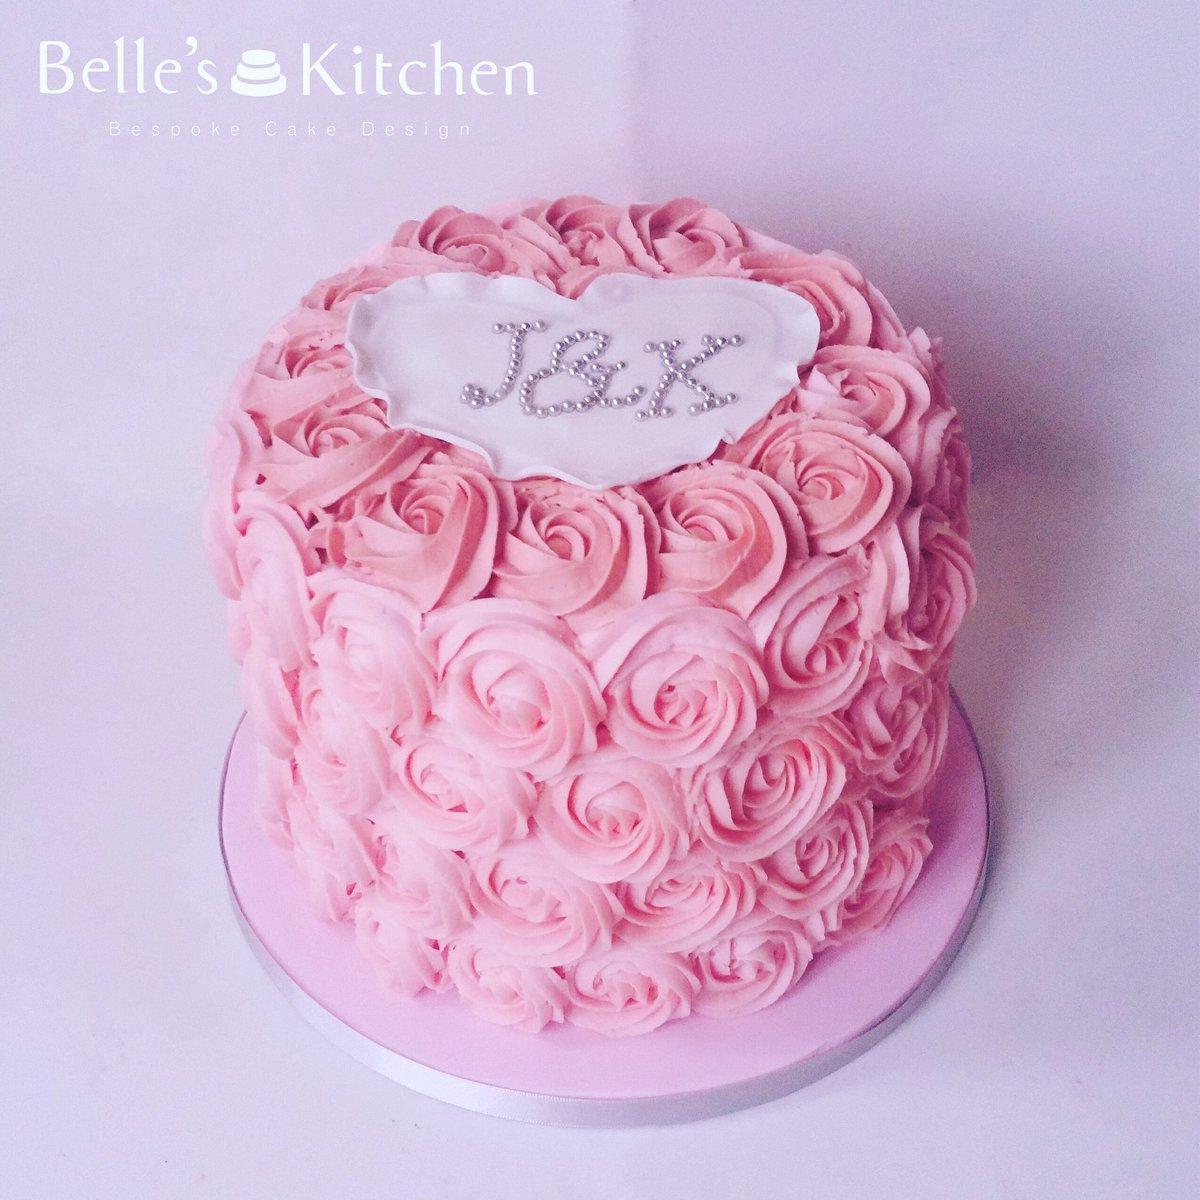 Belle S Kitchen On Twitter Simple Buttercream Rosettes For This